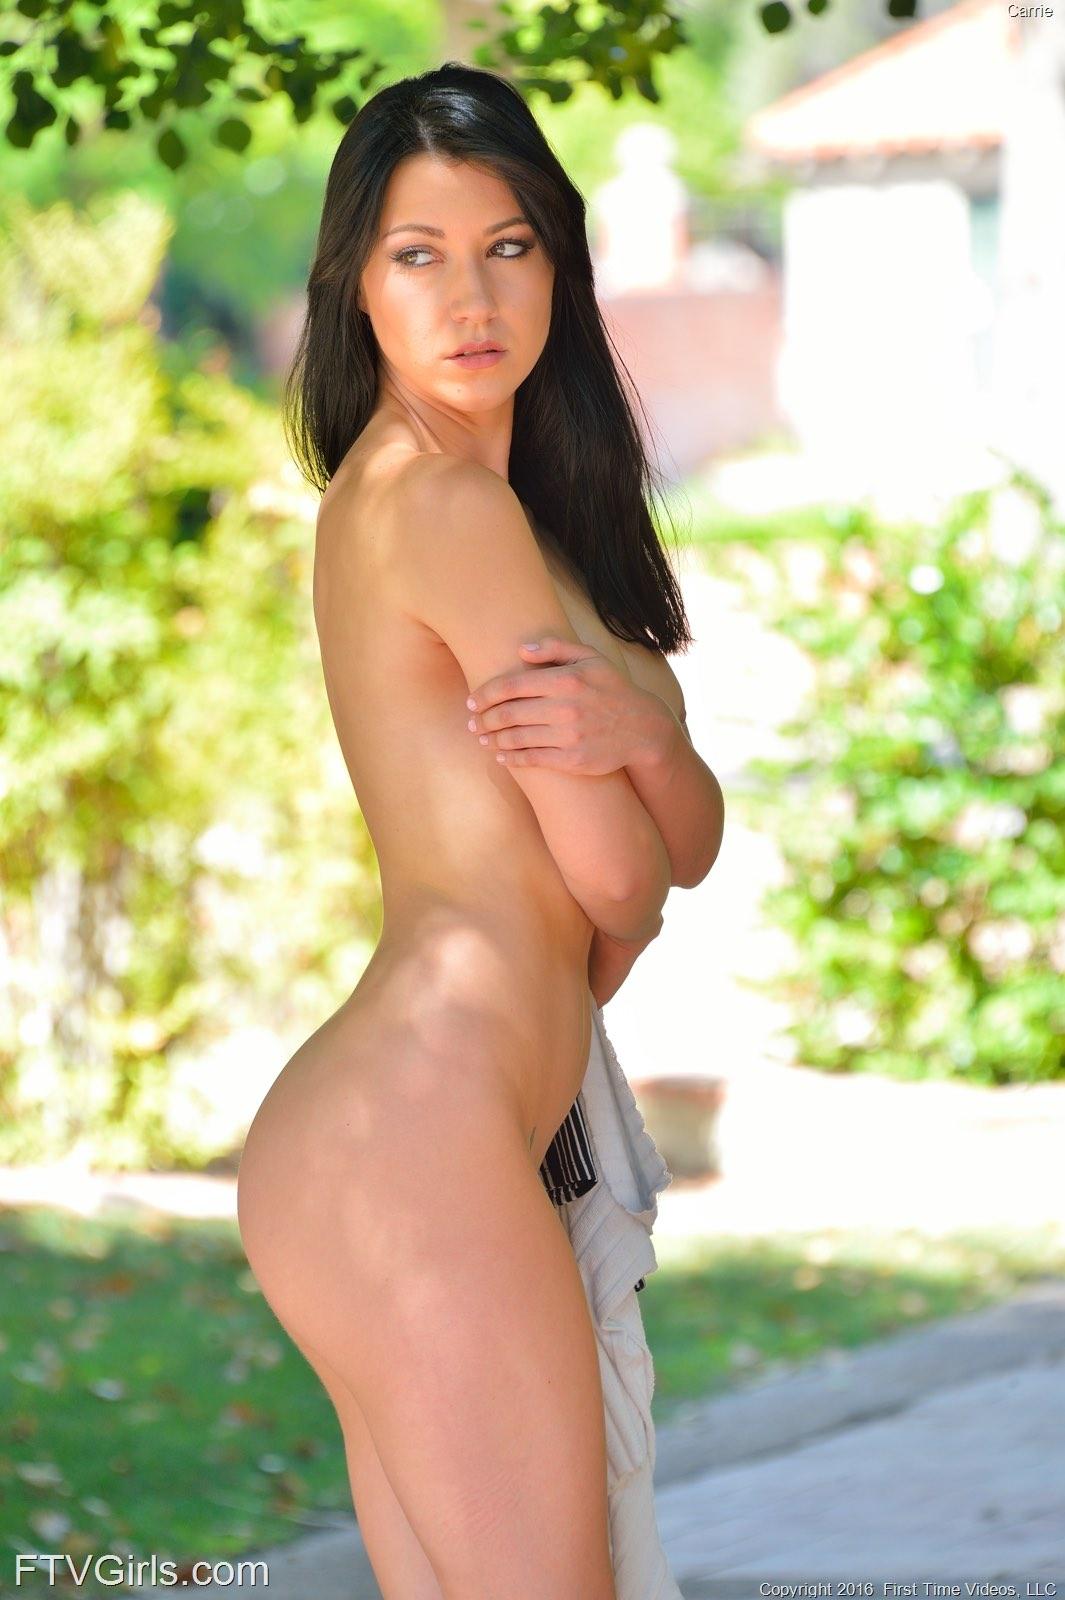 Jaime pressly nude fakes